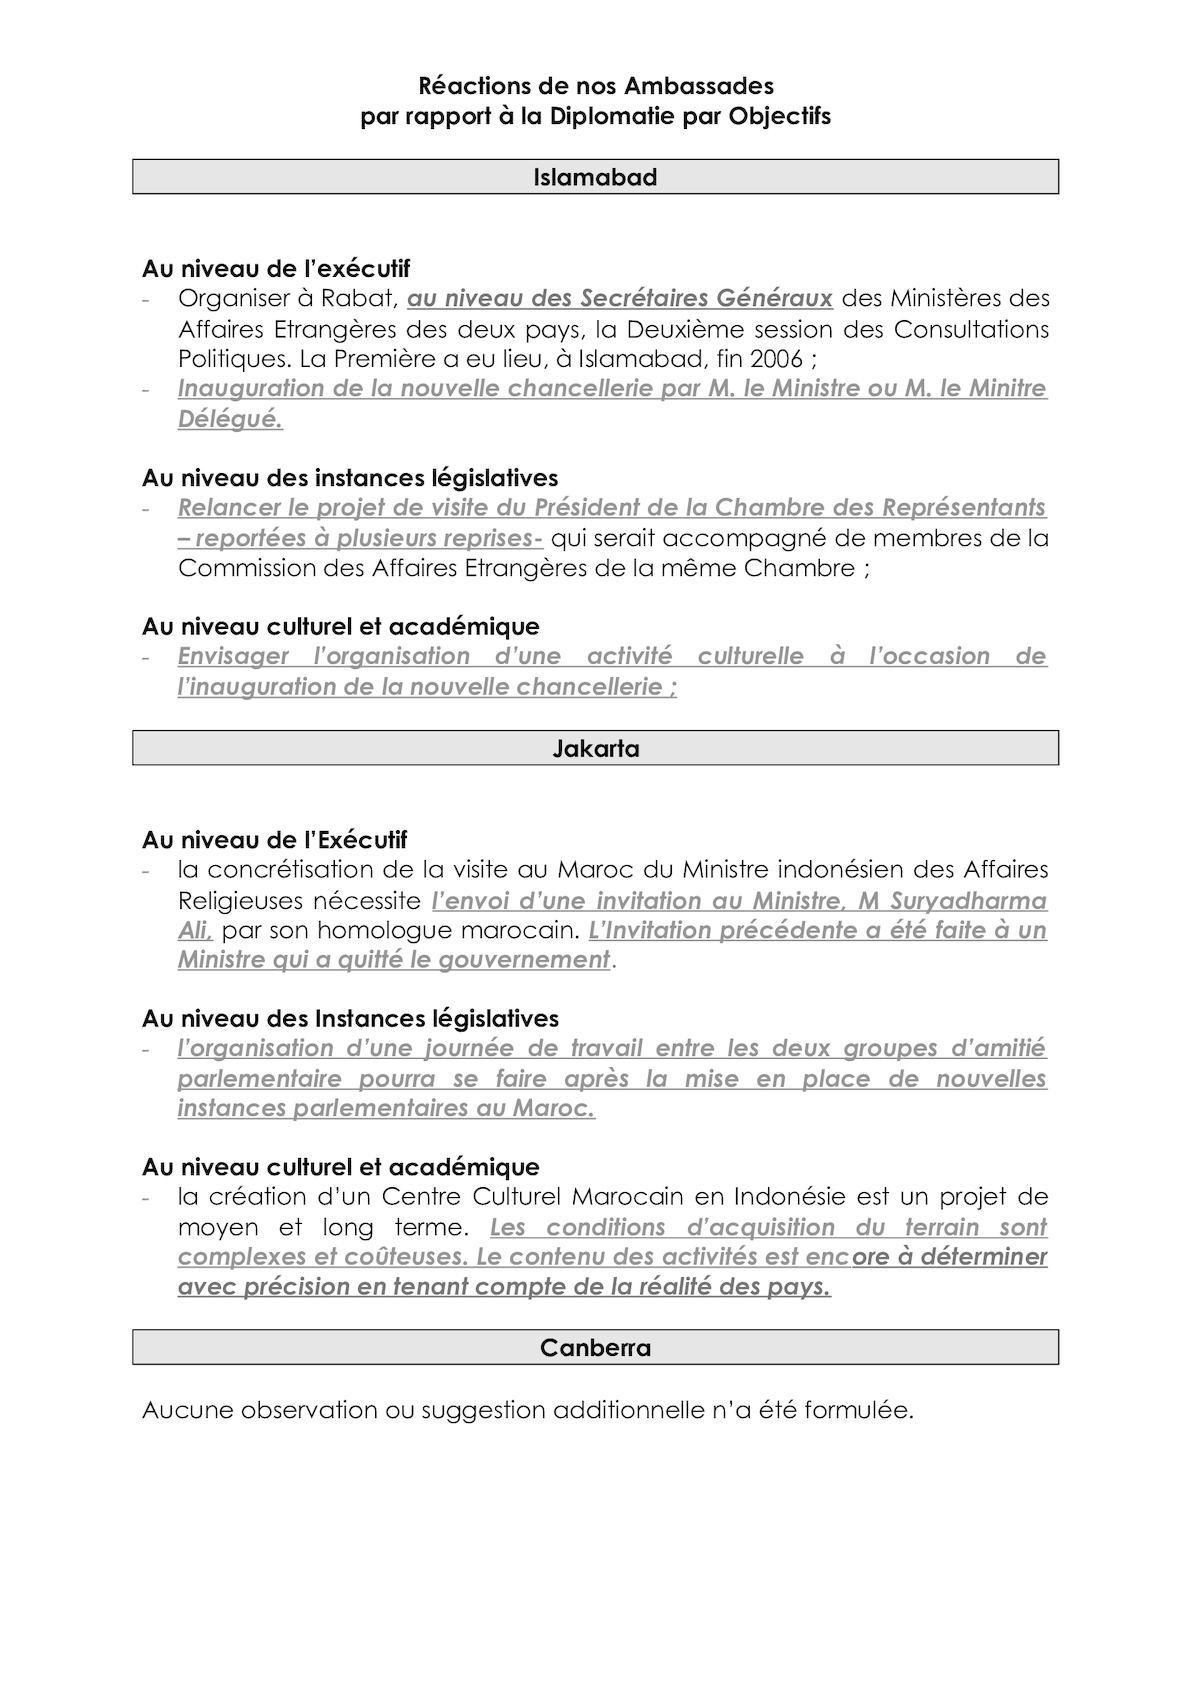 Réactions Ambassades DPO